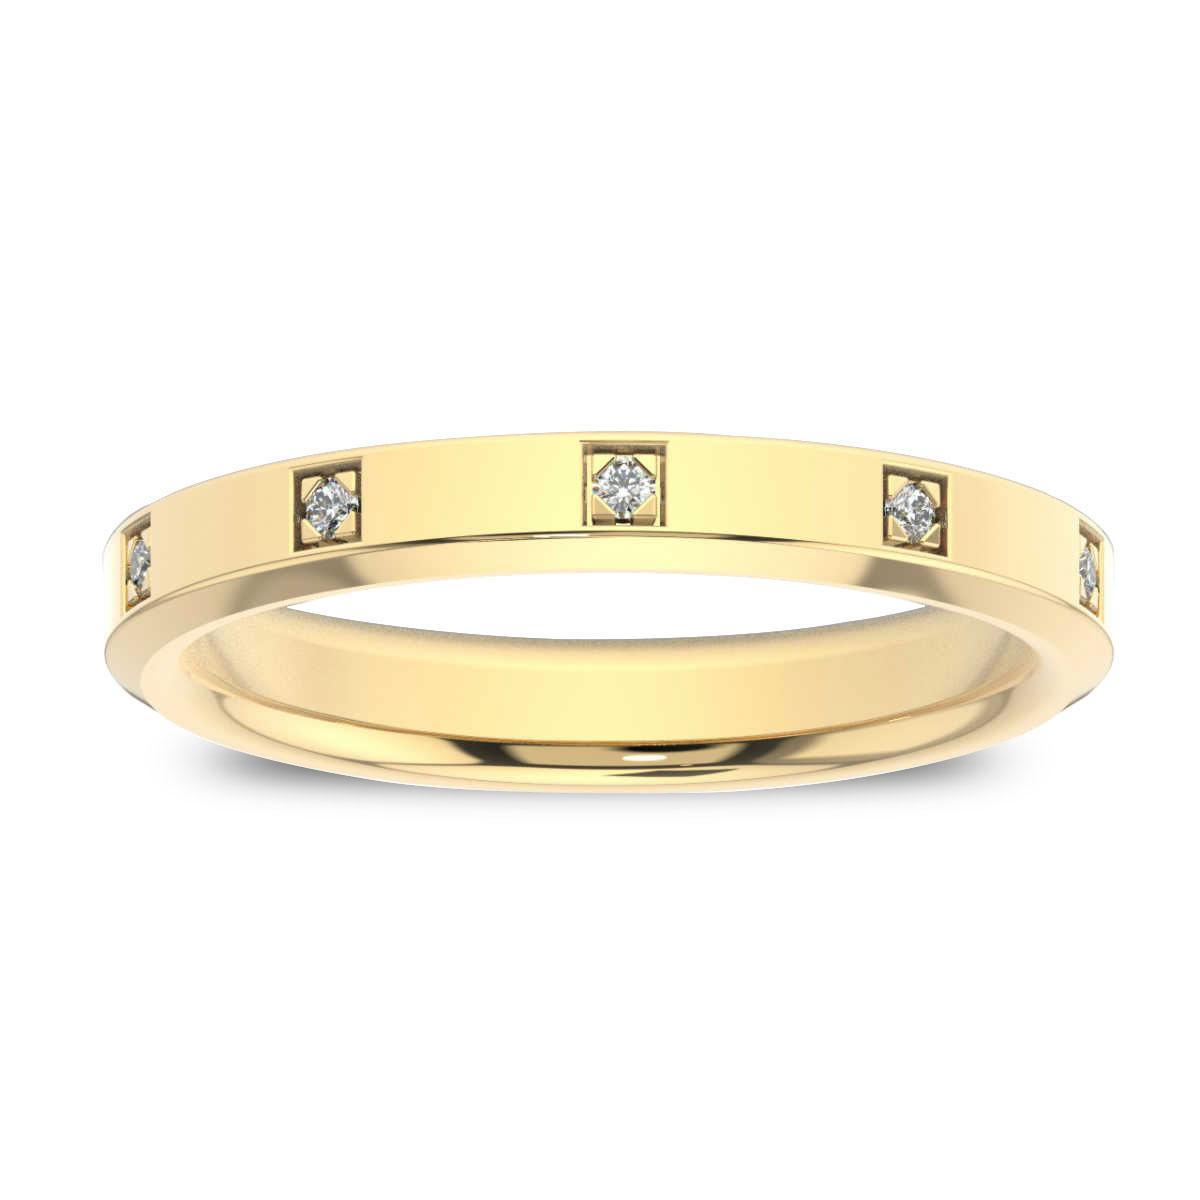 14K Yellow Gold Vivian Beveled Edge Eternity Diamond Ring (1/10 ct. tw)